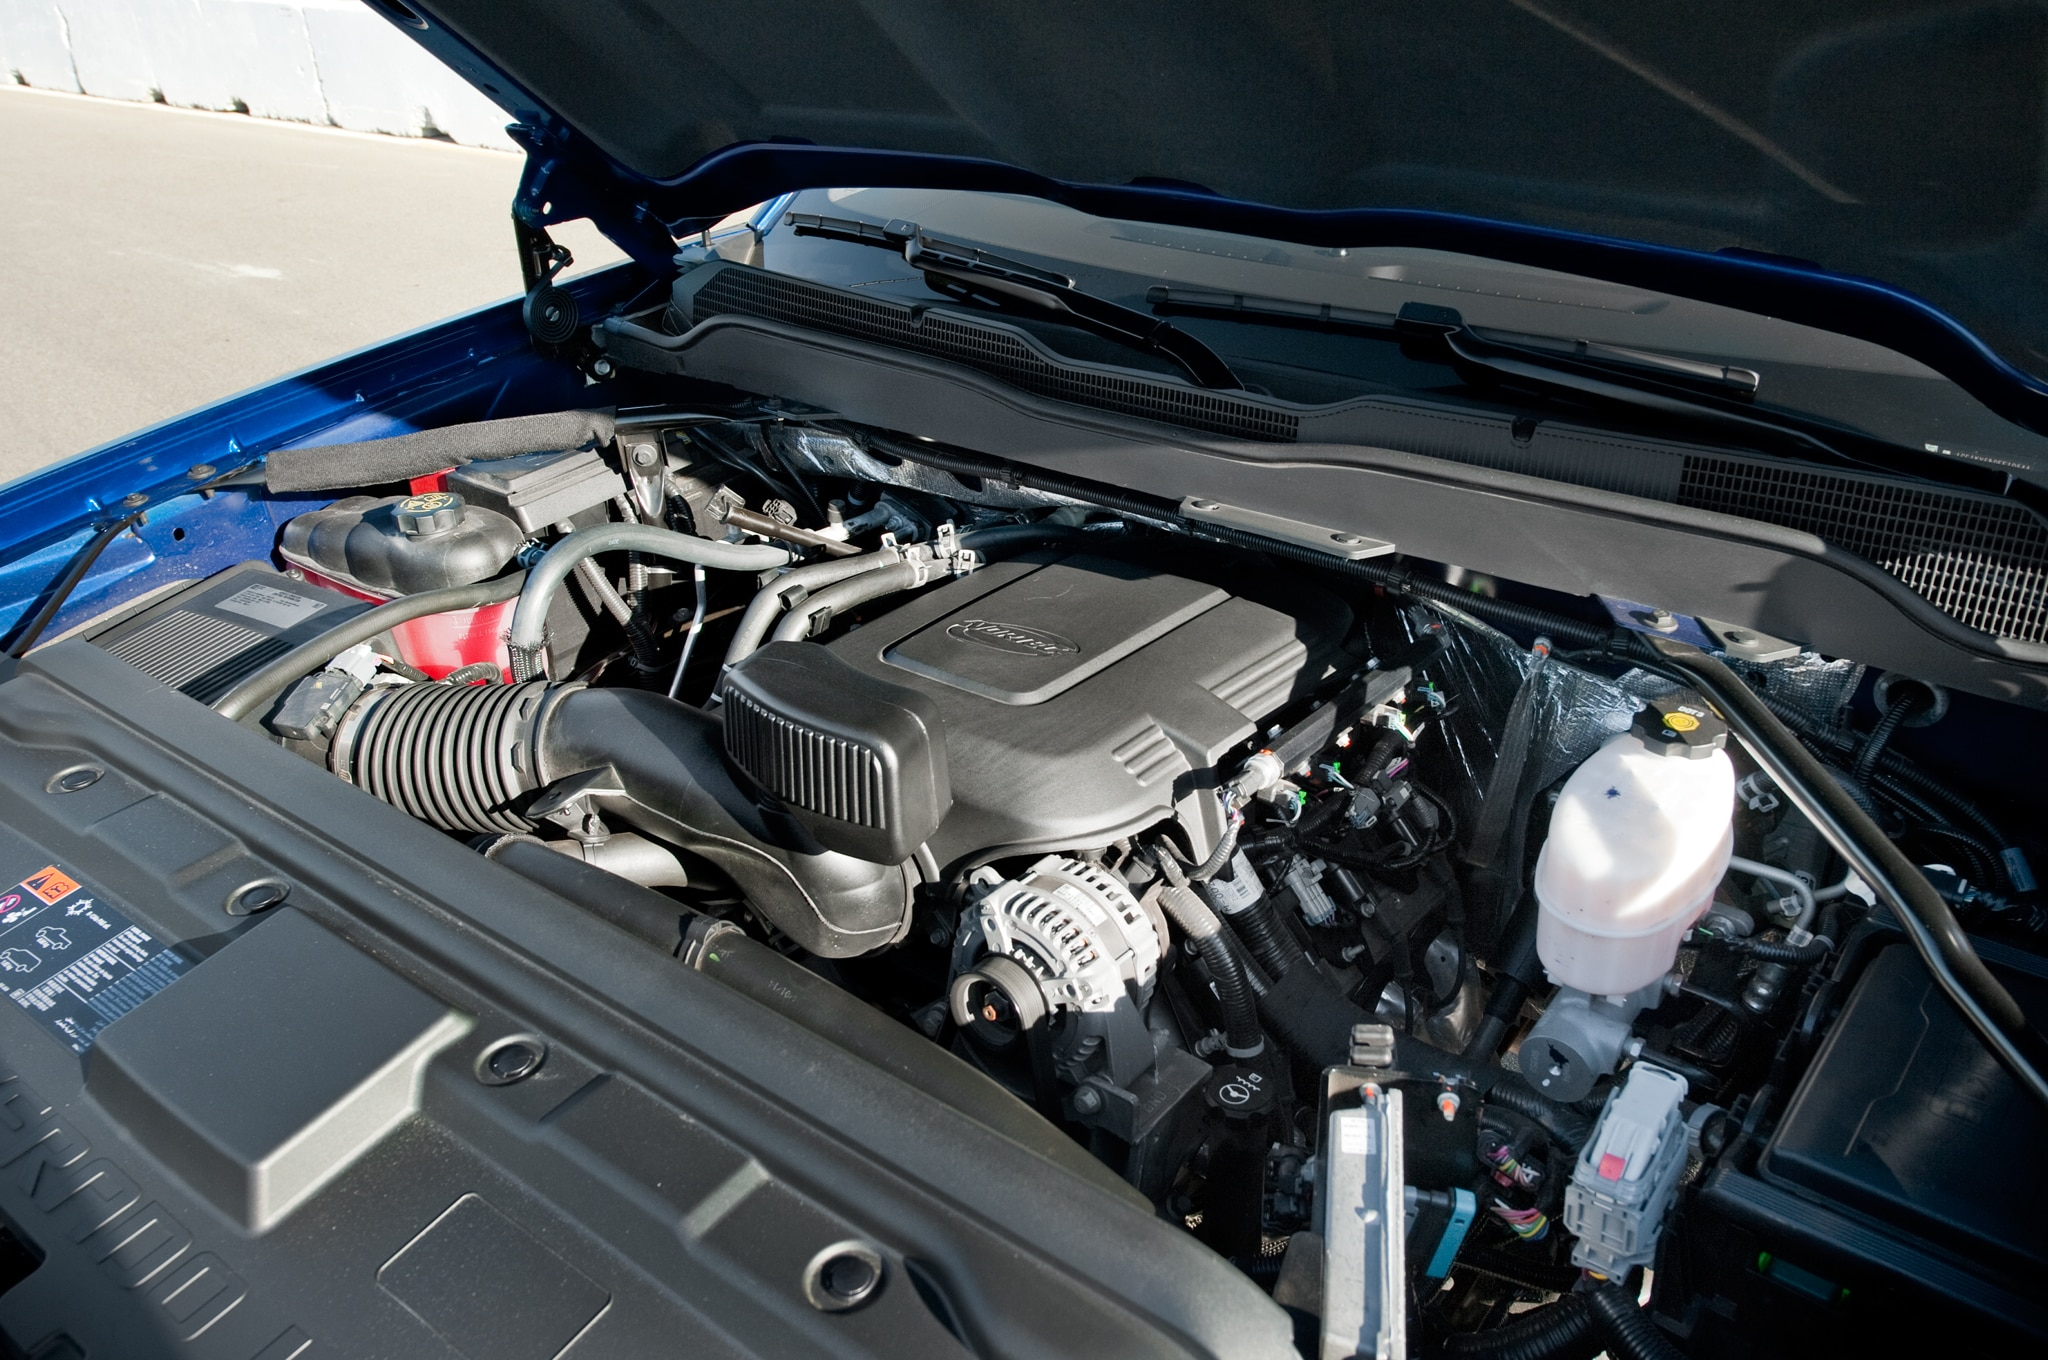 2015 Chevrolet Silverado 2500HD Duramax and 2500HD Vortec - Gas vs. DieselTruck Trend